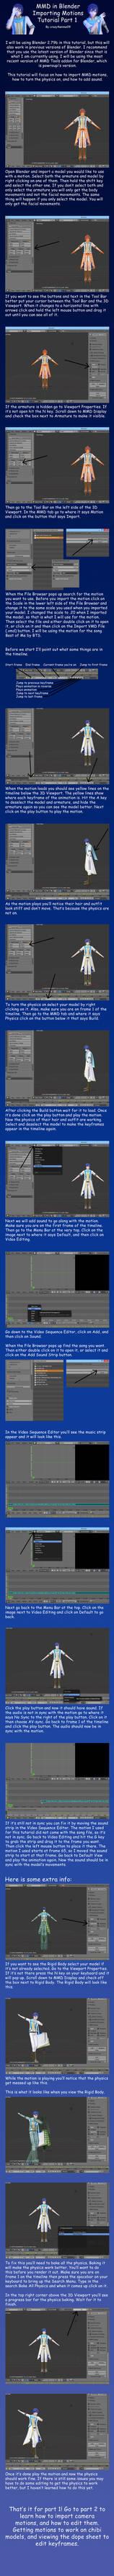 MMD in Blender 2.79 Importing Motions Tutorial